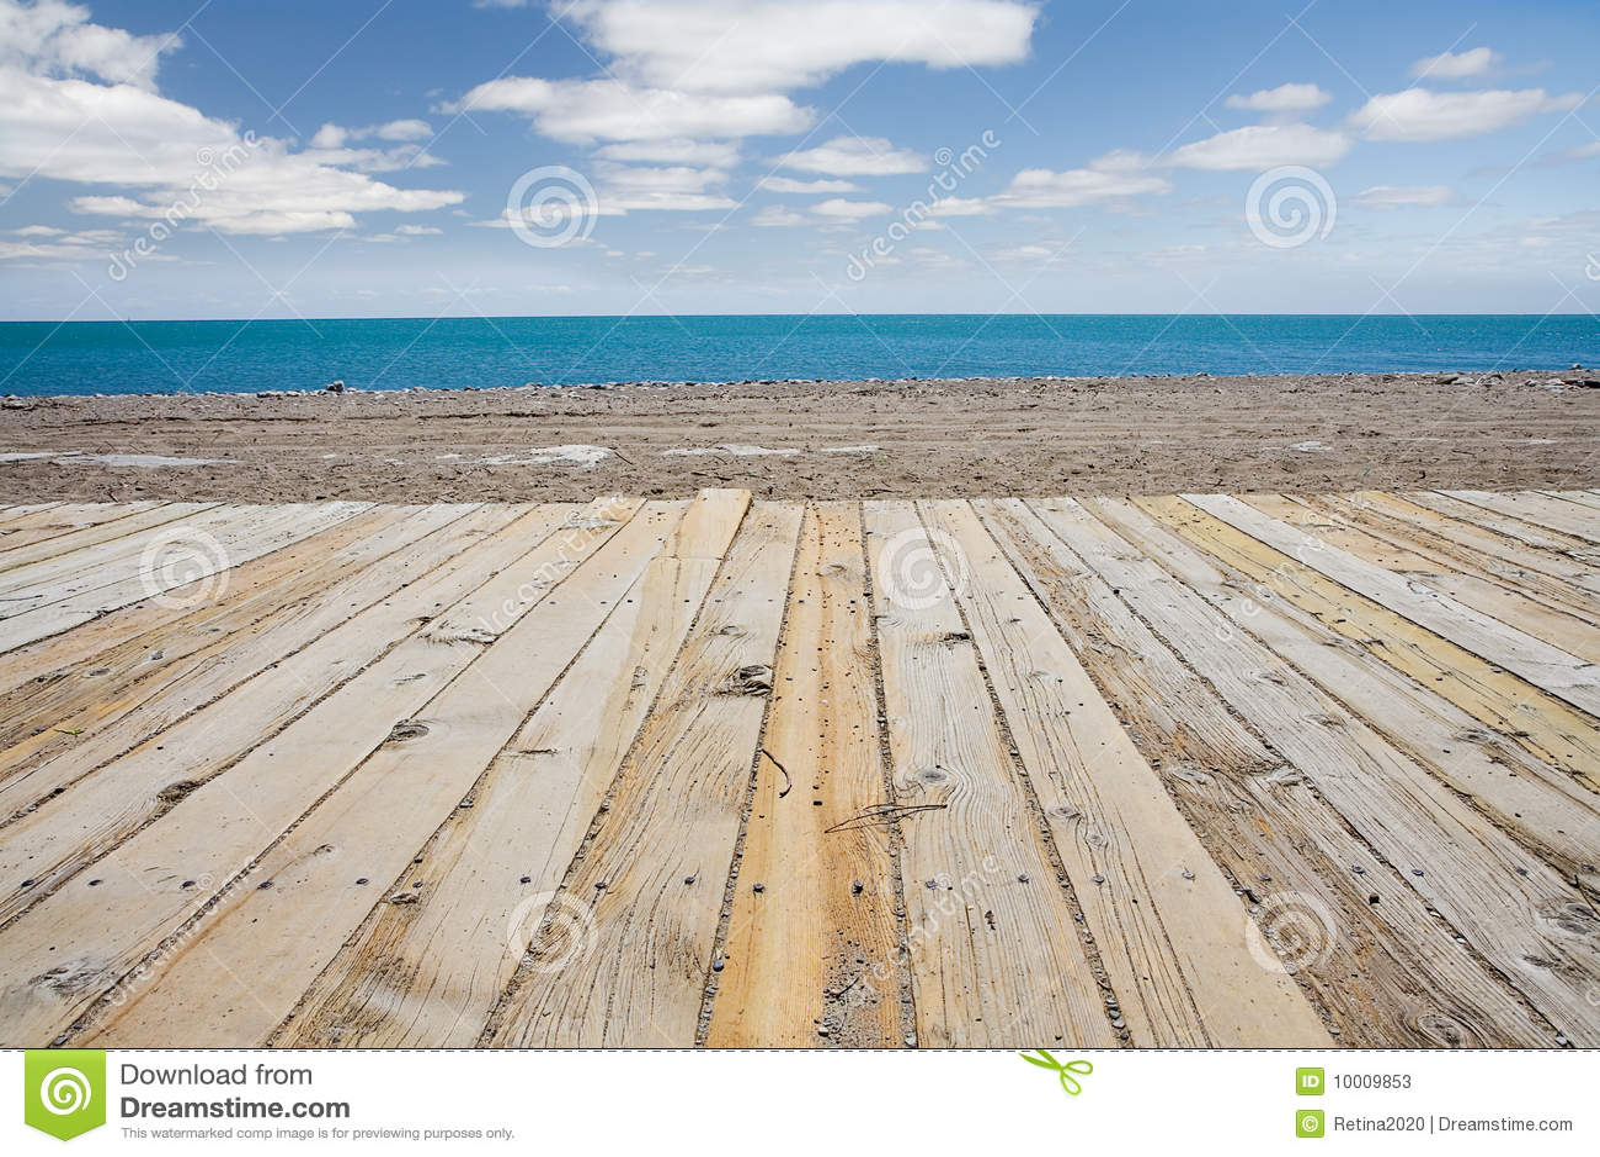 Beach Boardwalk Stock Photos - Image: 10009853